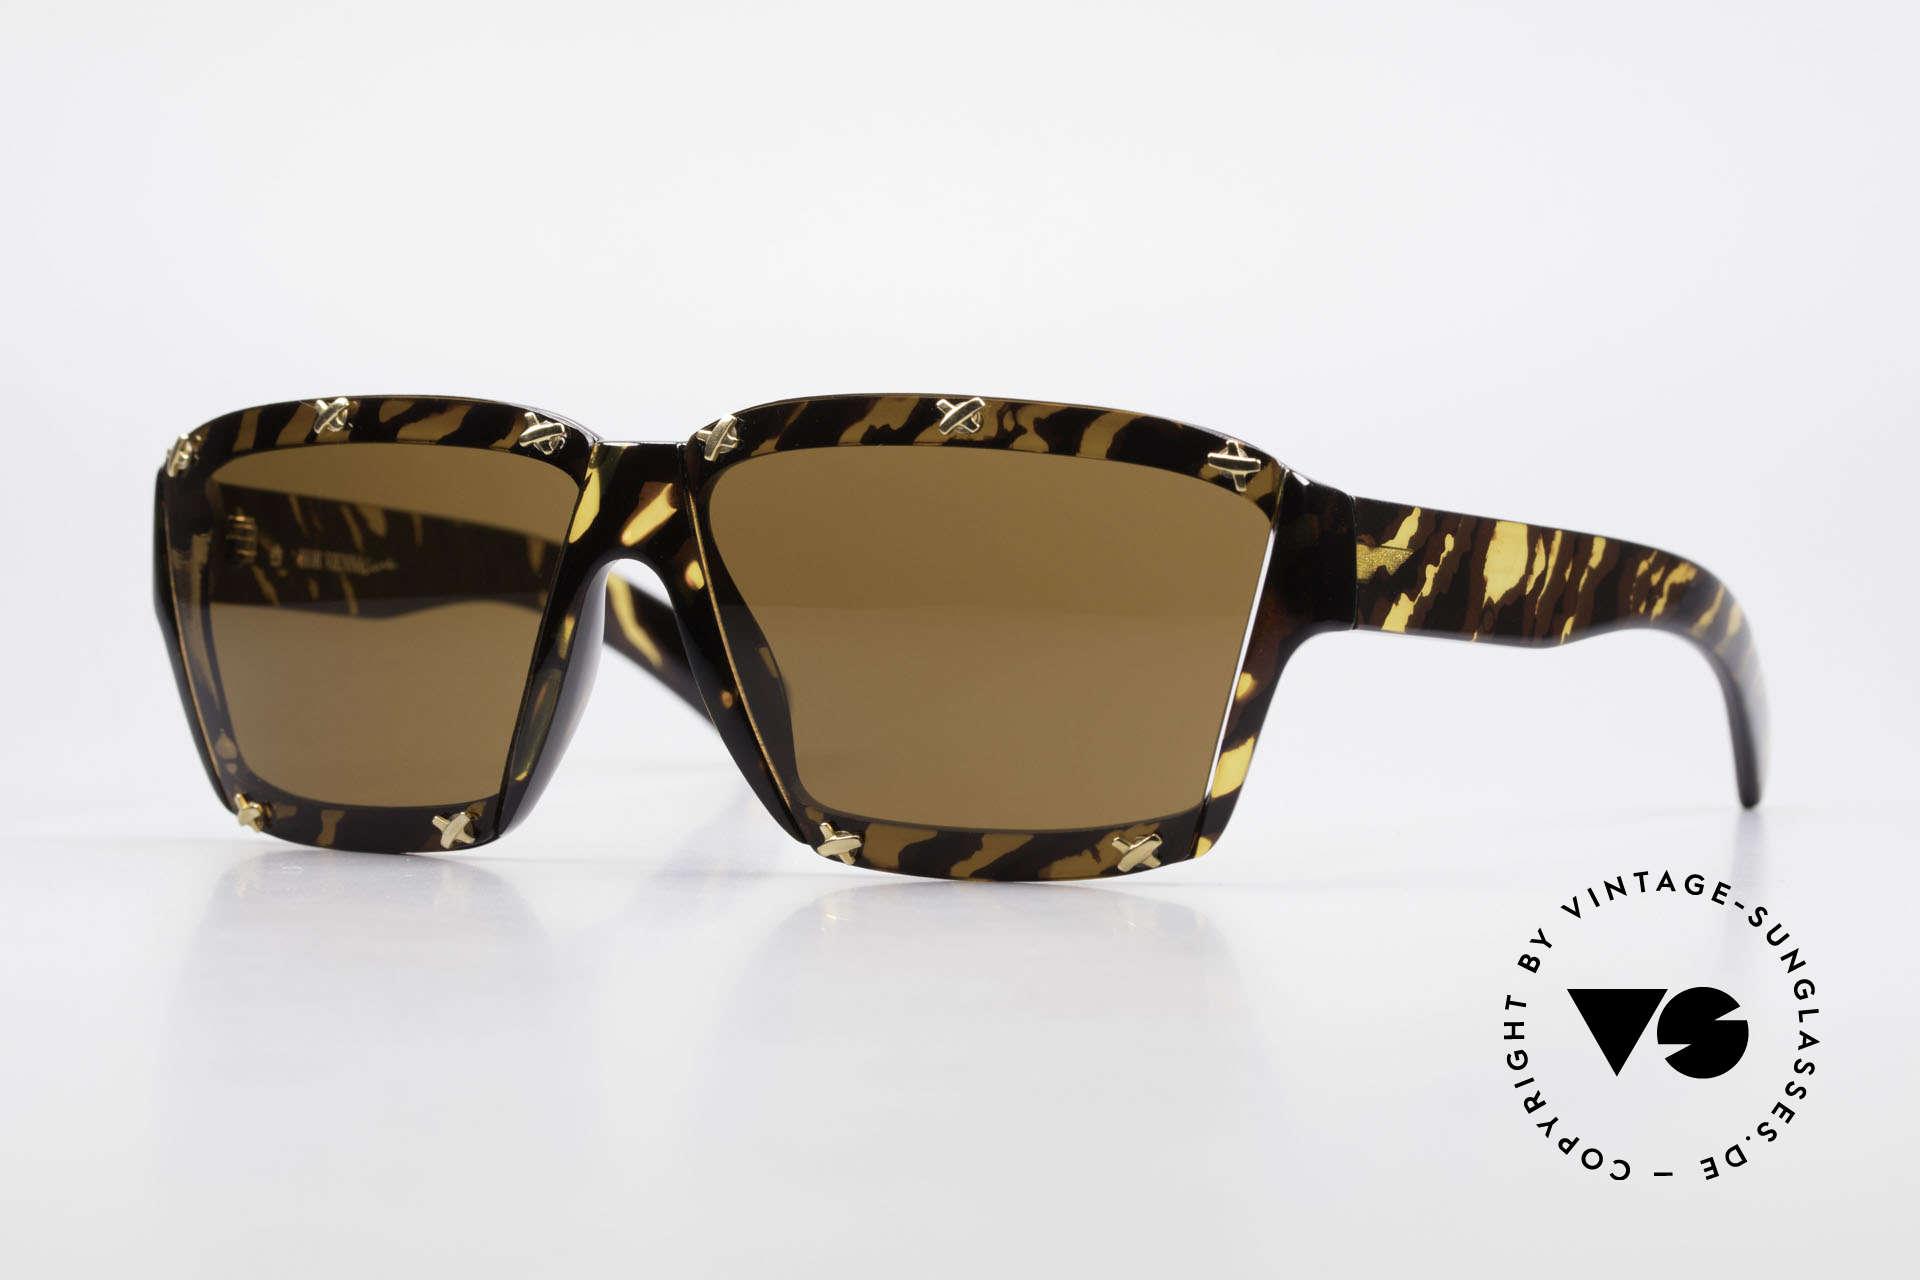 Paloma Picasso 3702 No Retro Sunglasses Original, vintage ladies sunglasses by P. PICASSO from 1990, Made for Women